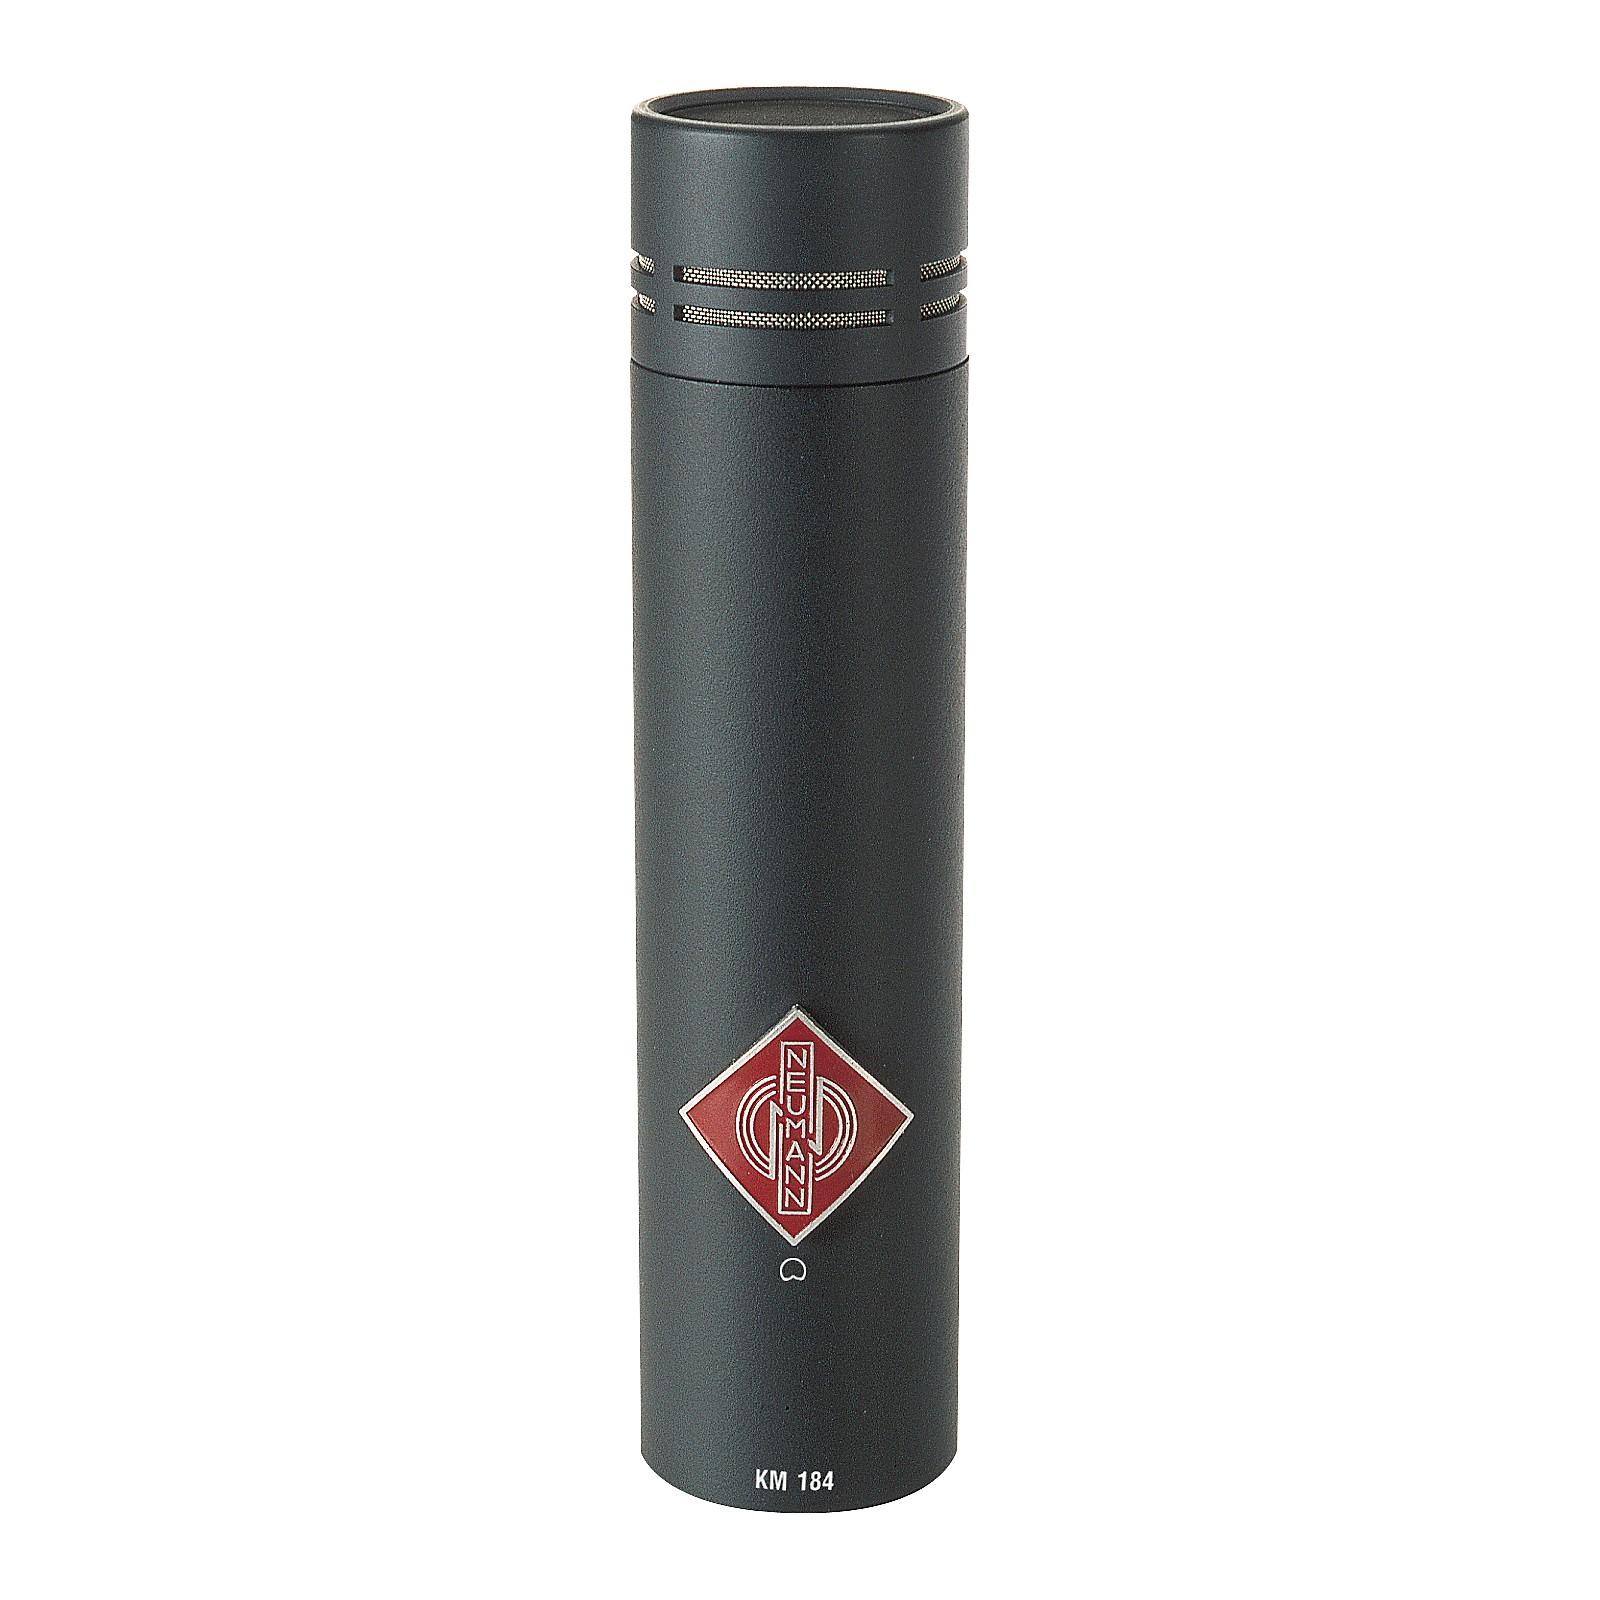 Neumann KM 184 Small Diaphragm Condenser Microphone